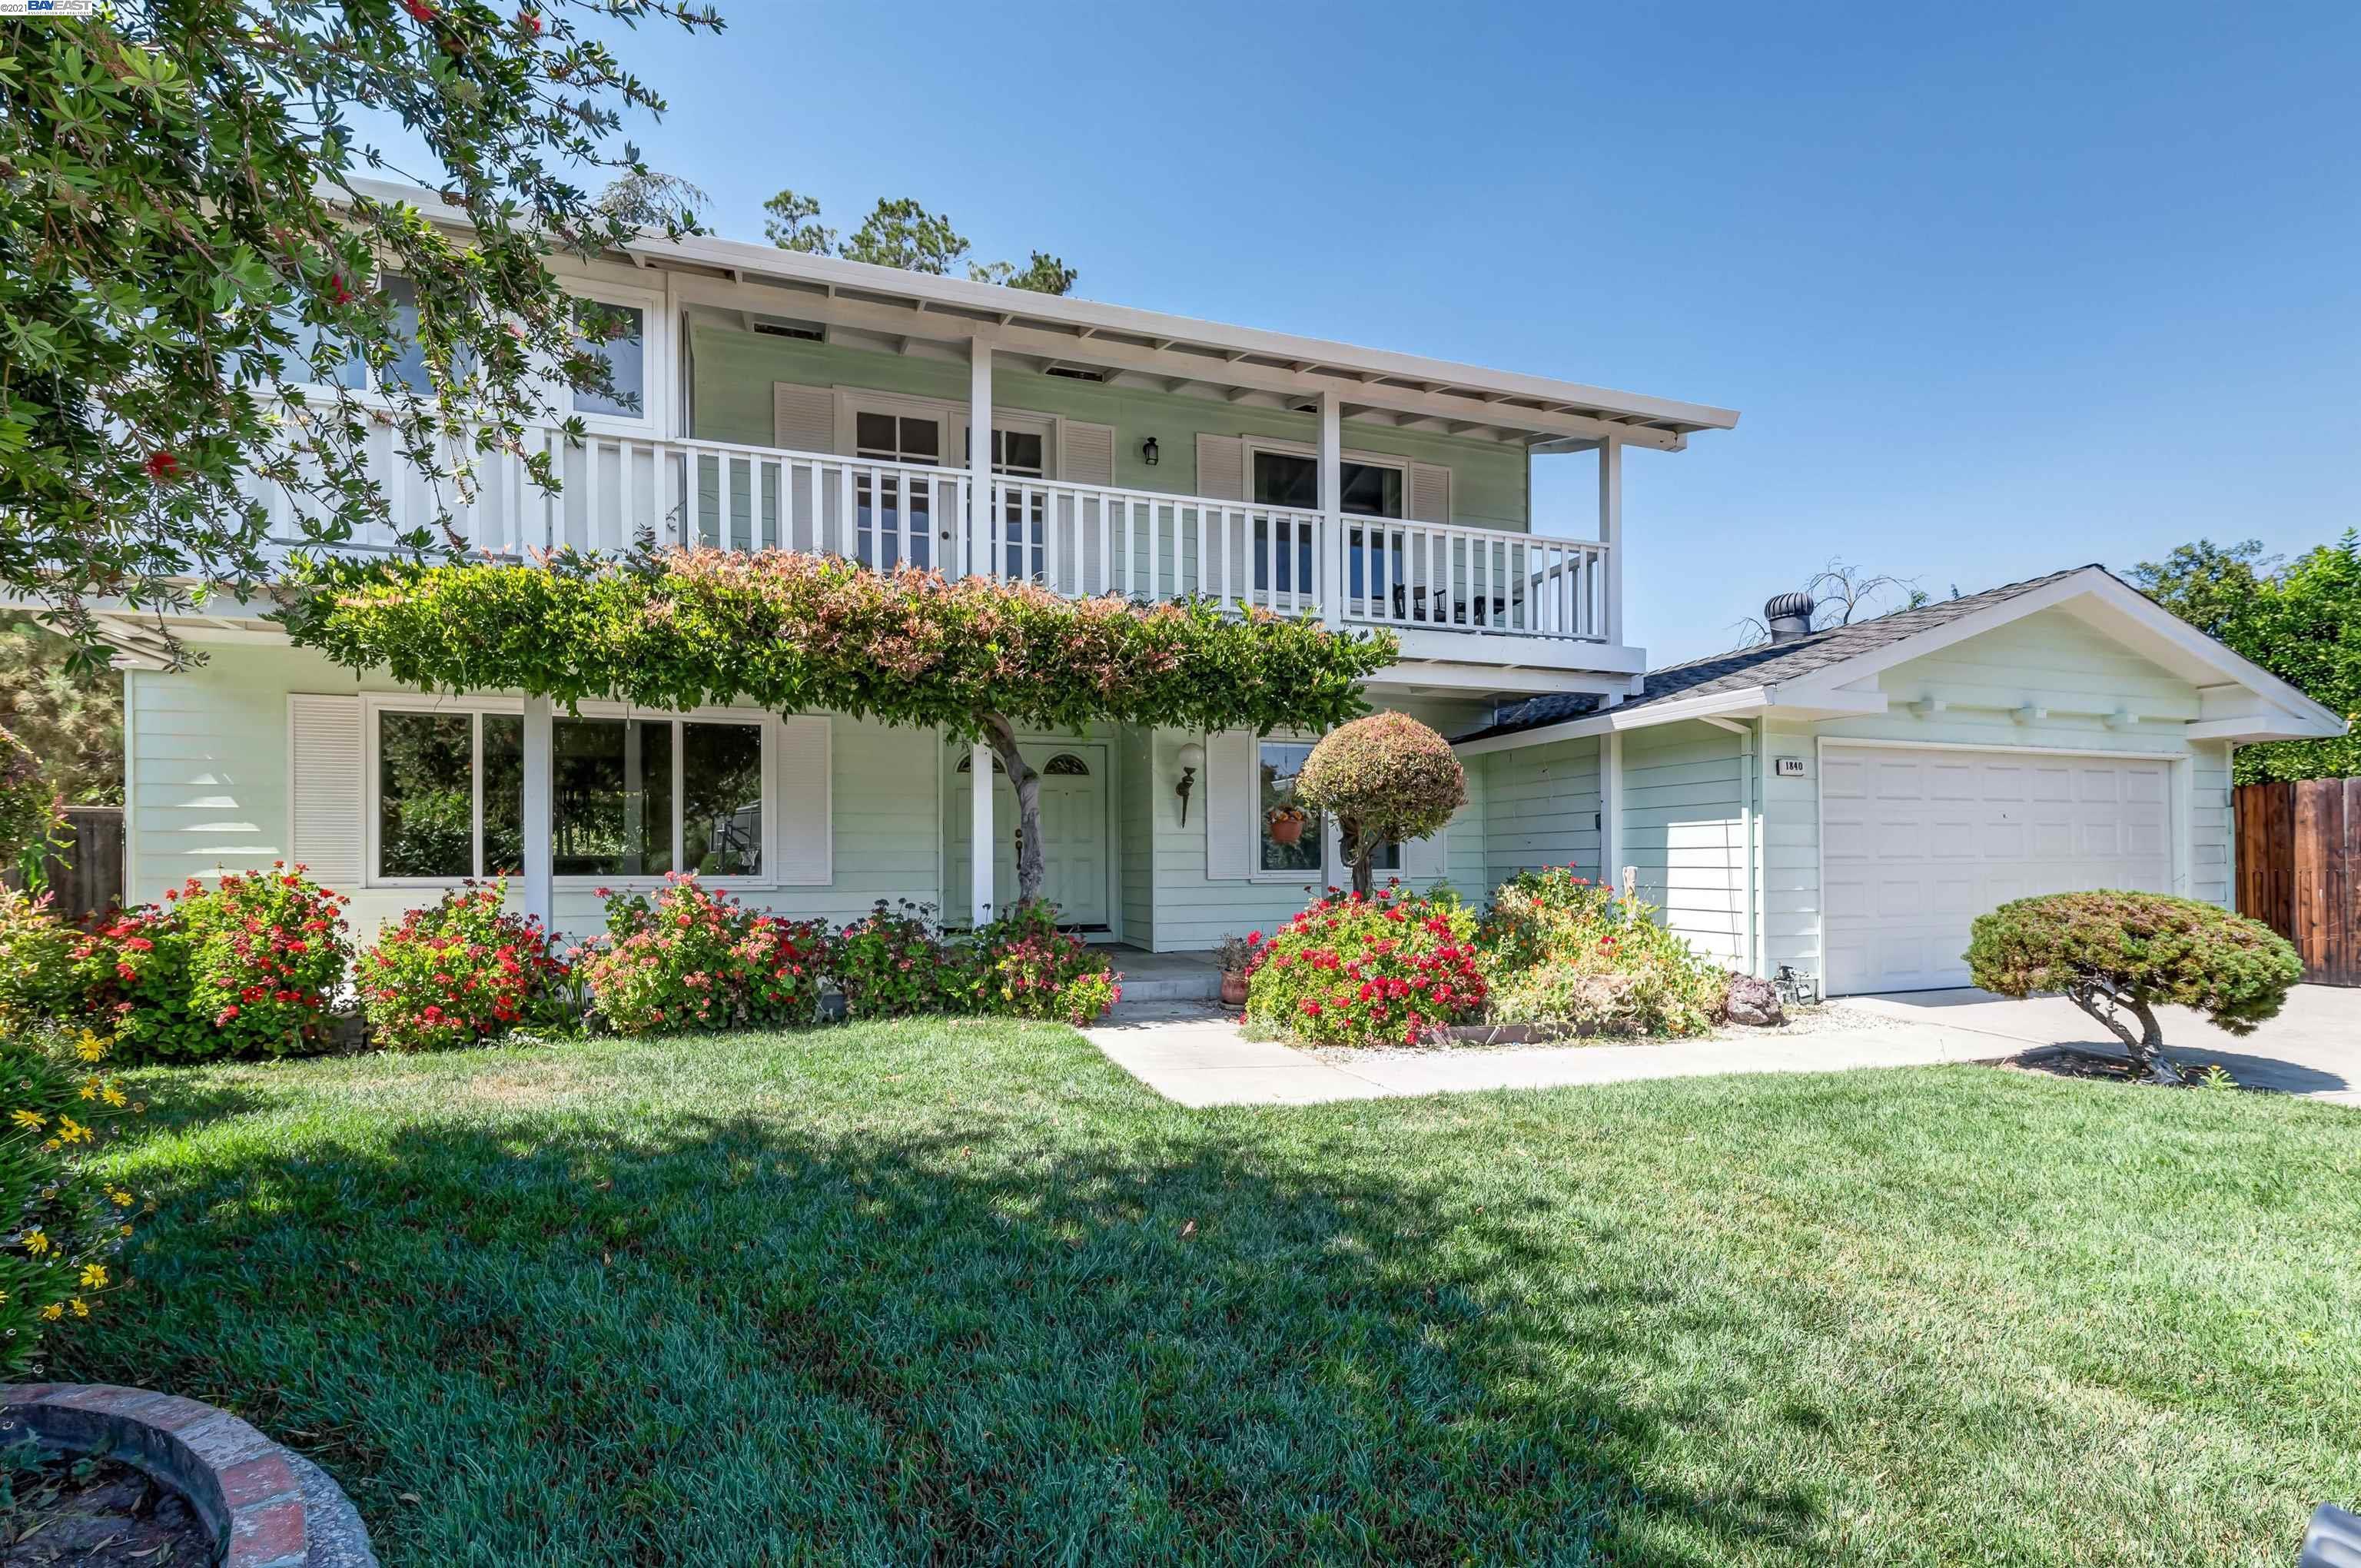 1840 Tanglewood Way, PLEASANTON, CA 94566